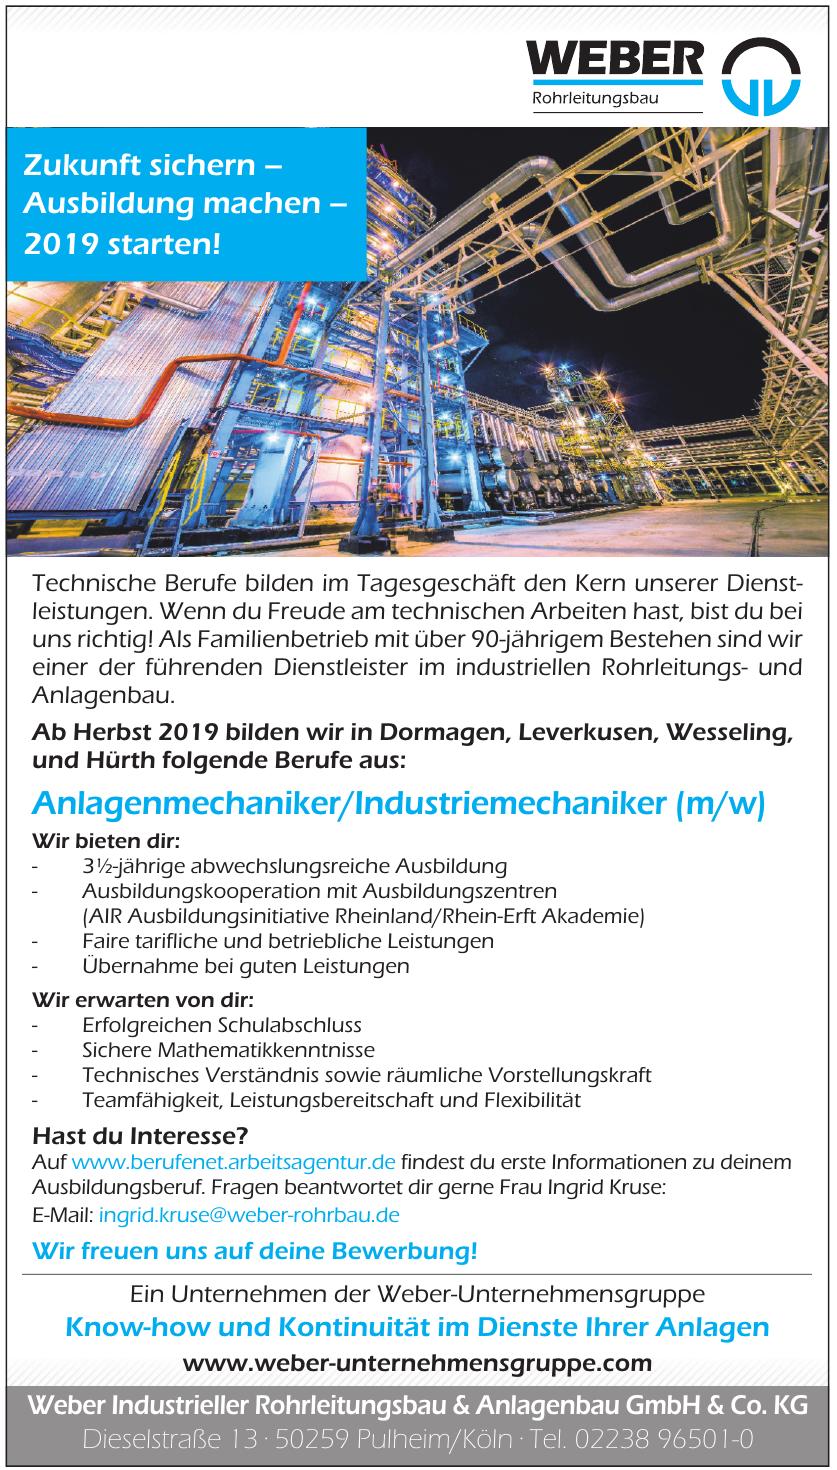 Weber Industrieller Rohrleitungsbau & Anlagenbau GmbH & Co. KG